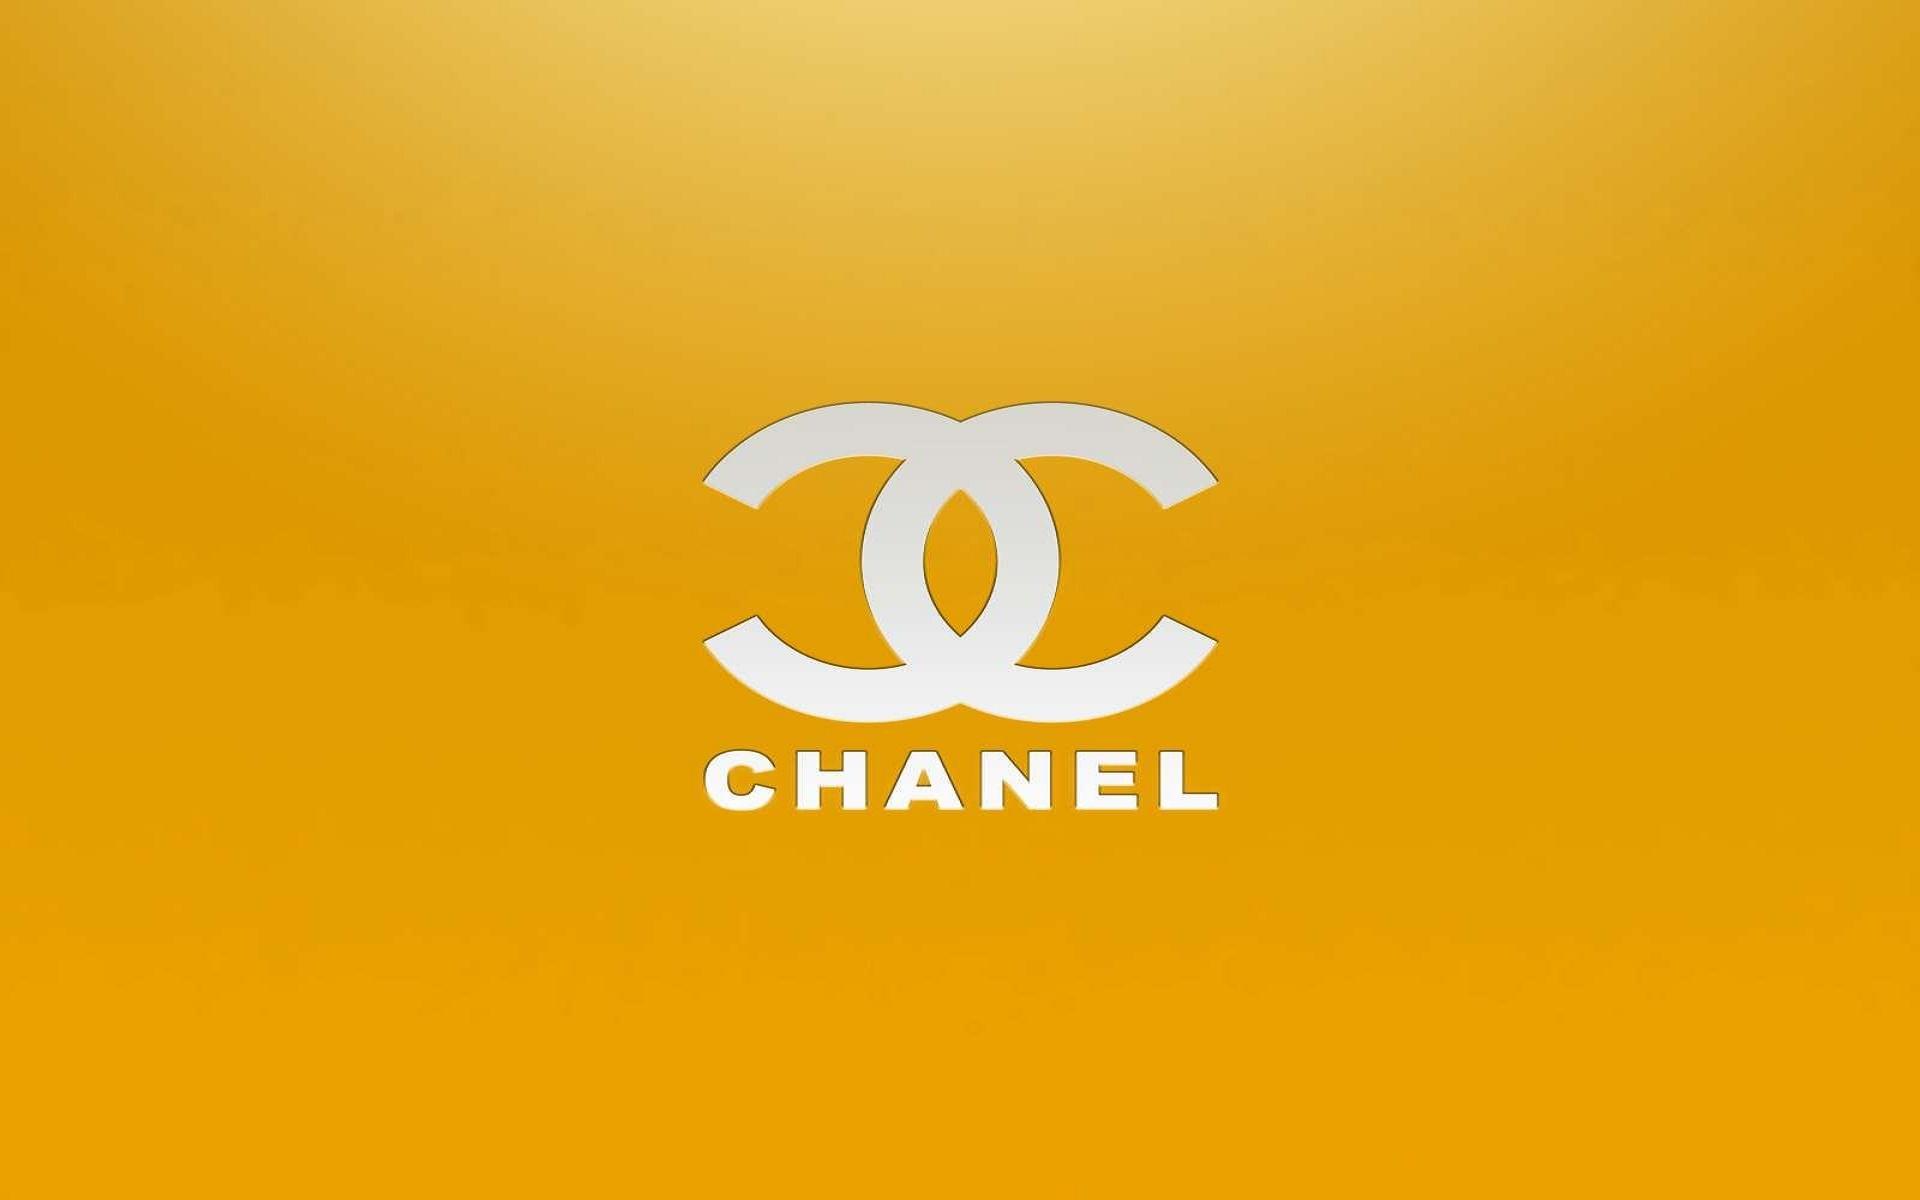 Christmas 3d Wallpapers Free Download Logo Chanel Wallpapers Hd Pixelstalk Net